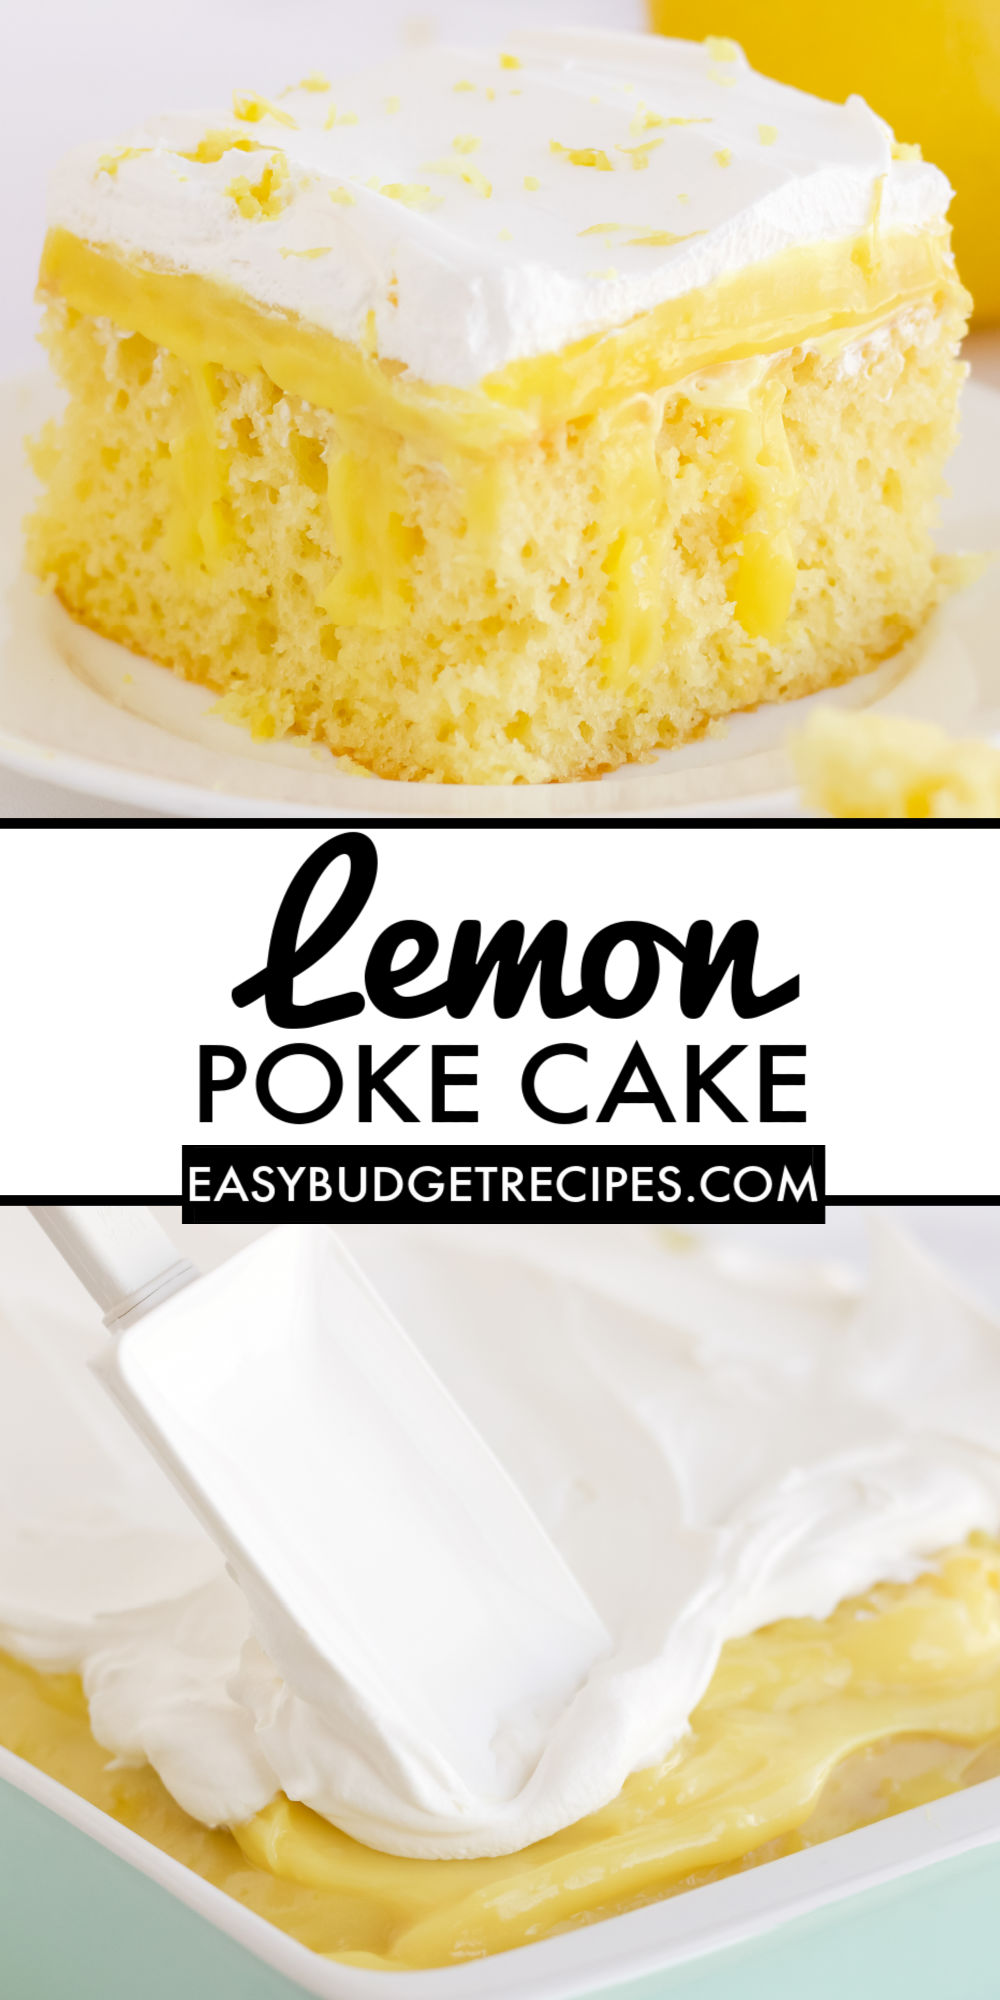 This easy Lemon Poke Cake is made with lemon cake mix, lemon pudding mix, milk, and cool whip. It's a refreshing lemon dessert that is a family favorite.  via @easybudgetrecipes